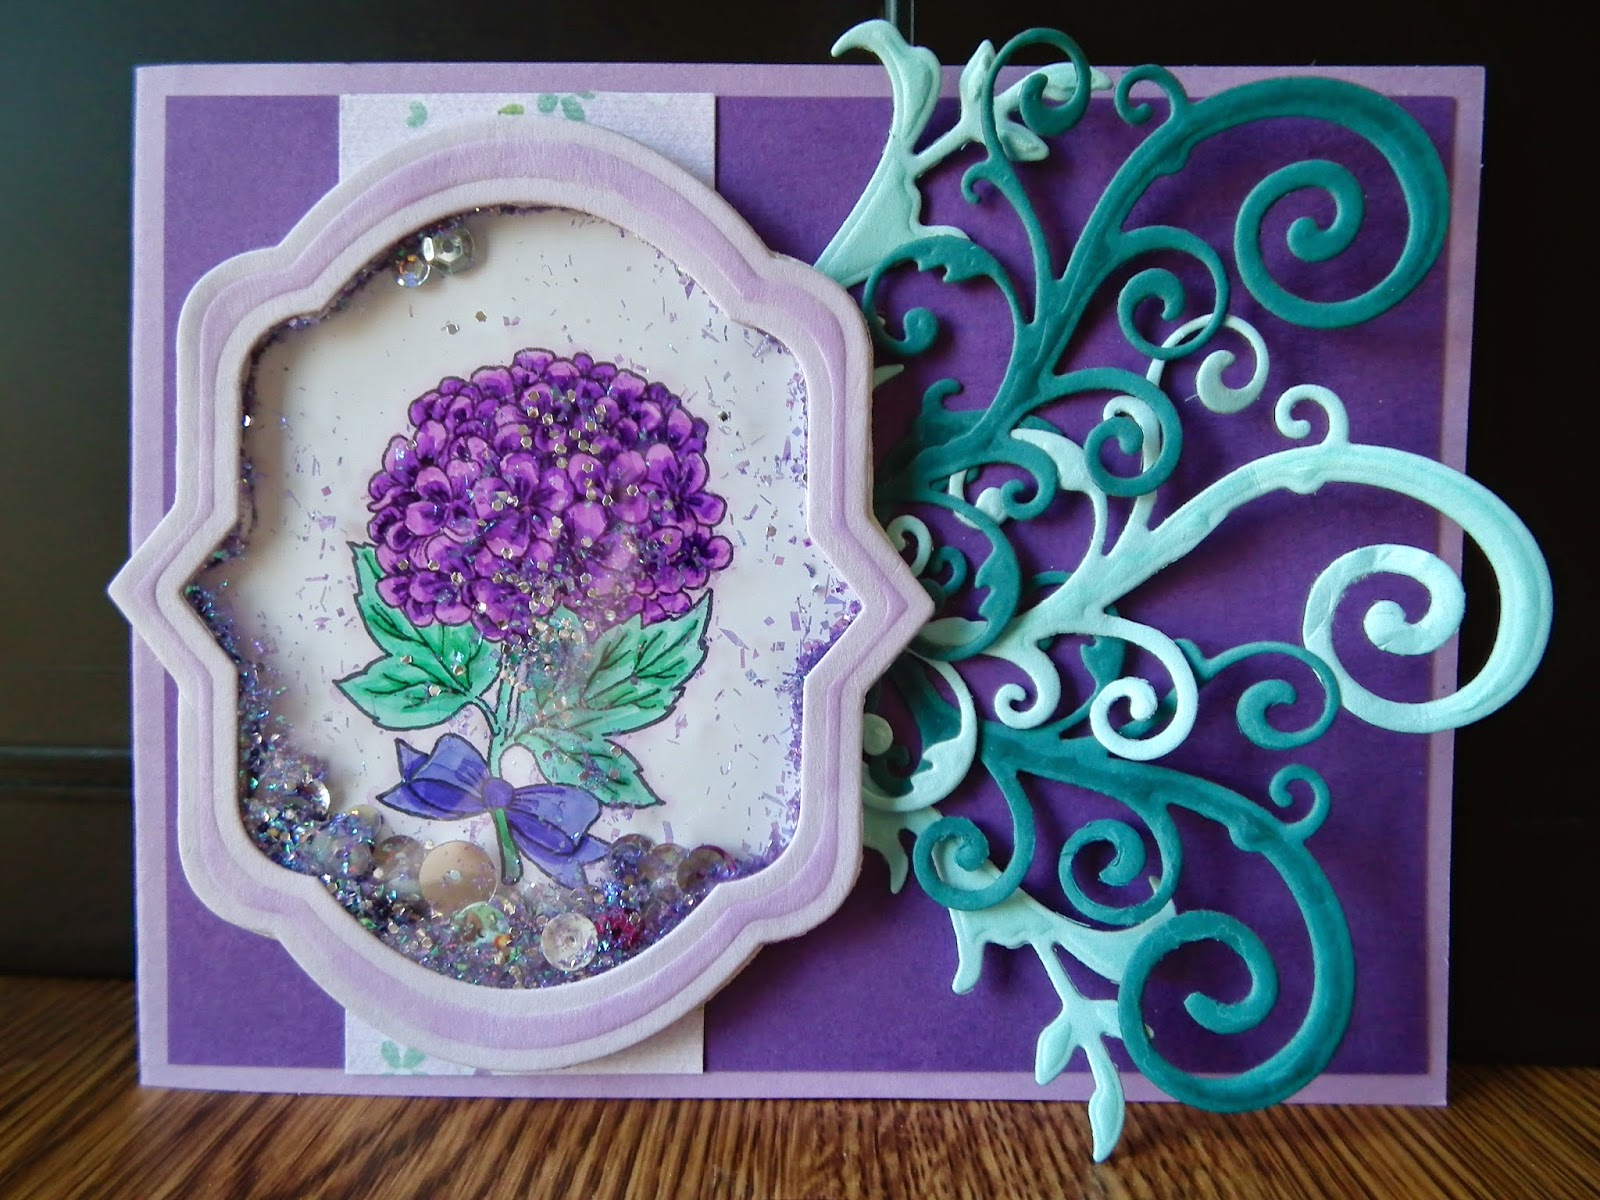 Crafty Card Tricks: Flower Shaker Card